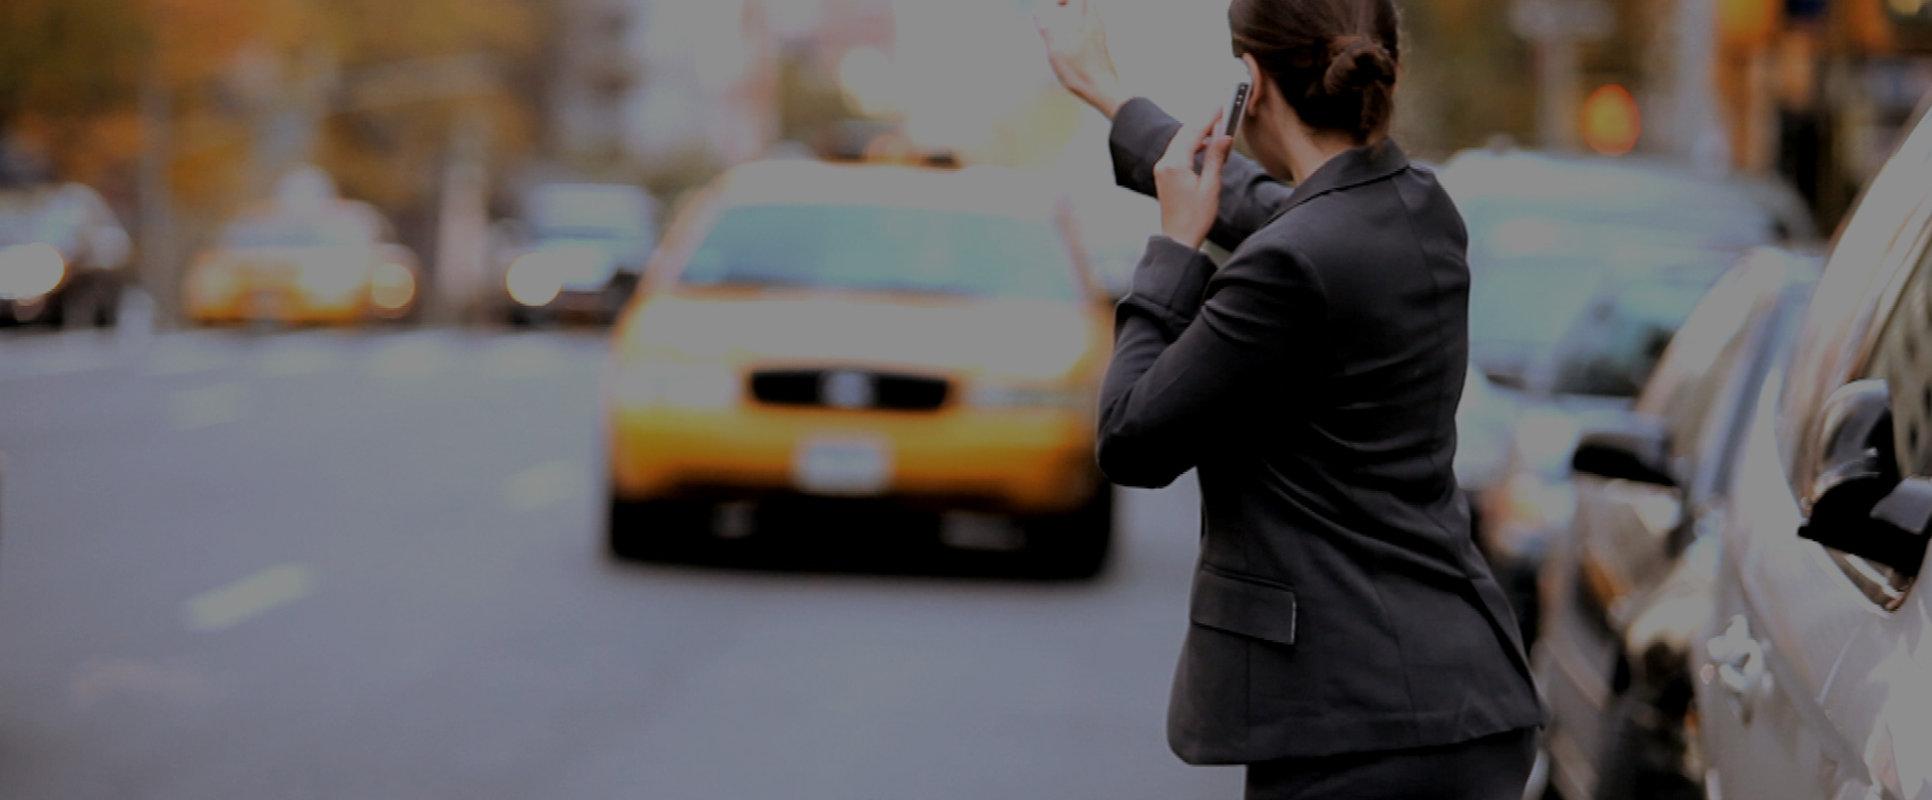 city-cab-taxi-app-kitchener-waterloo